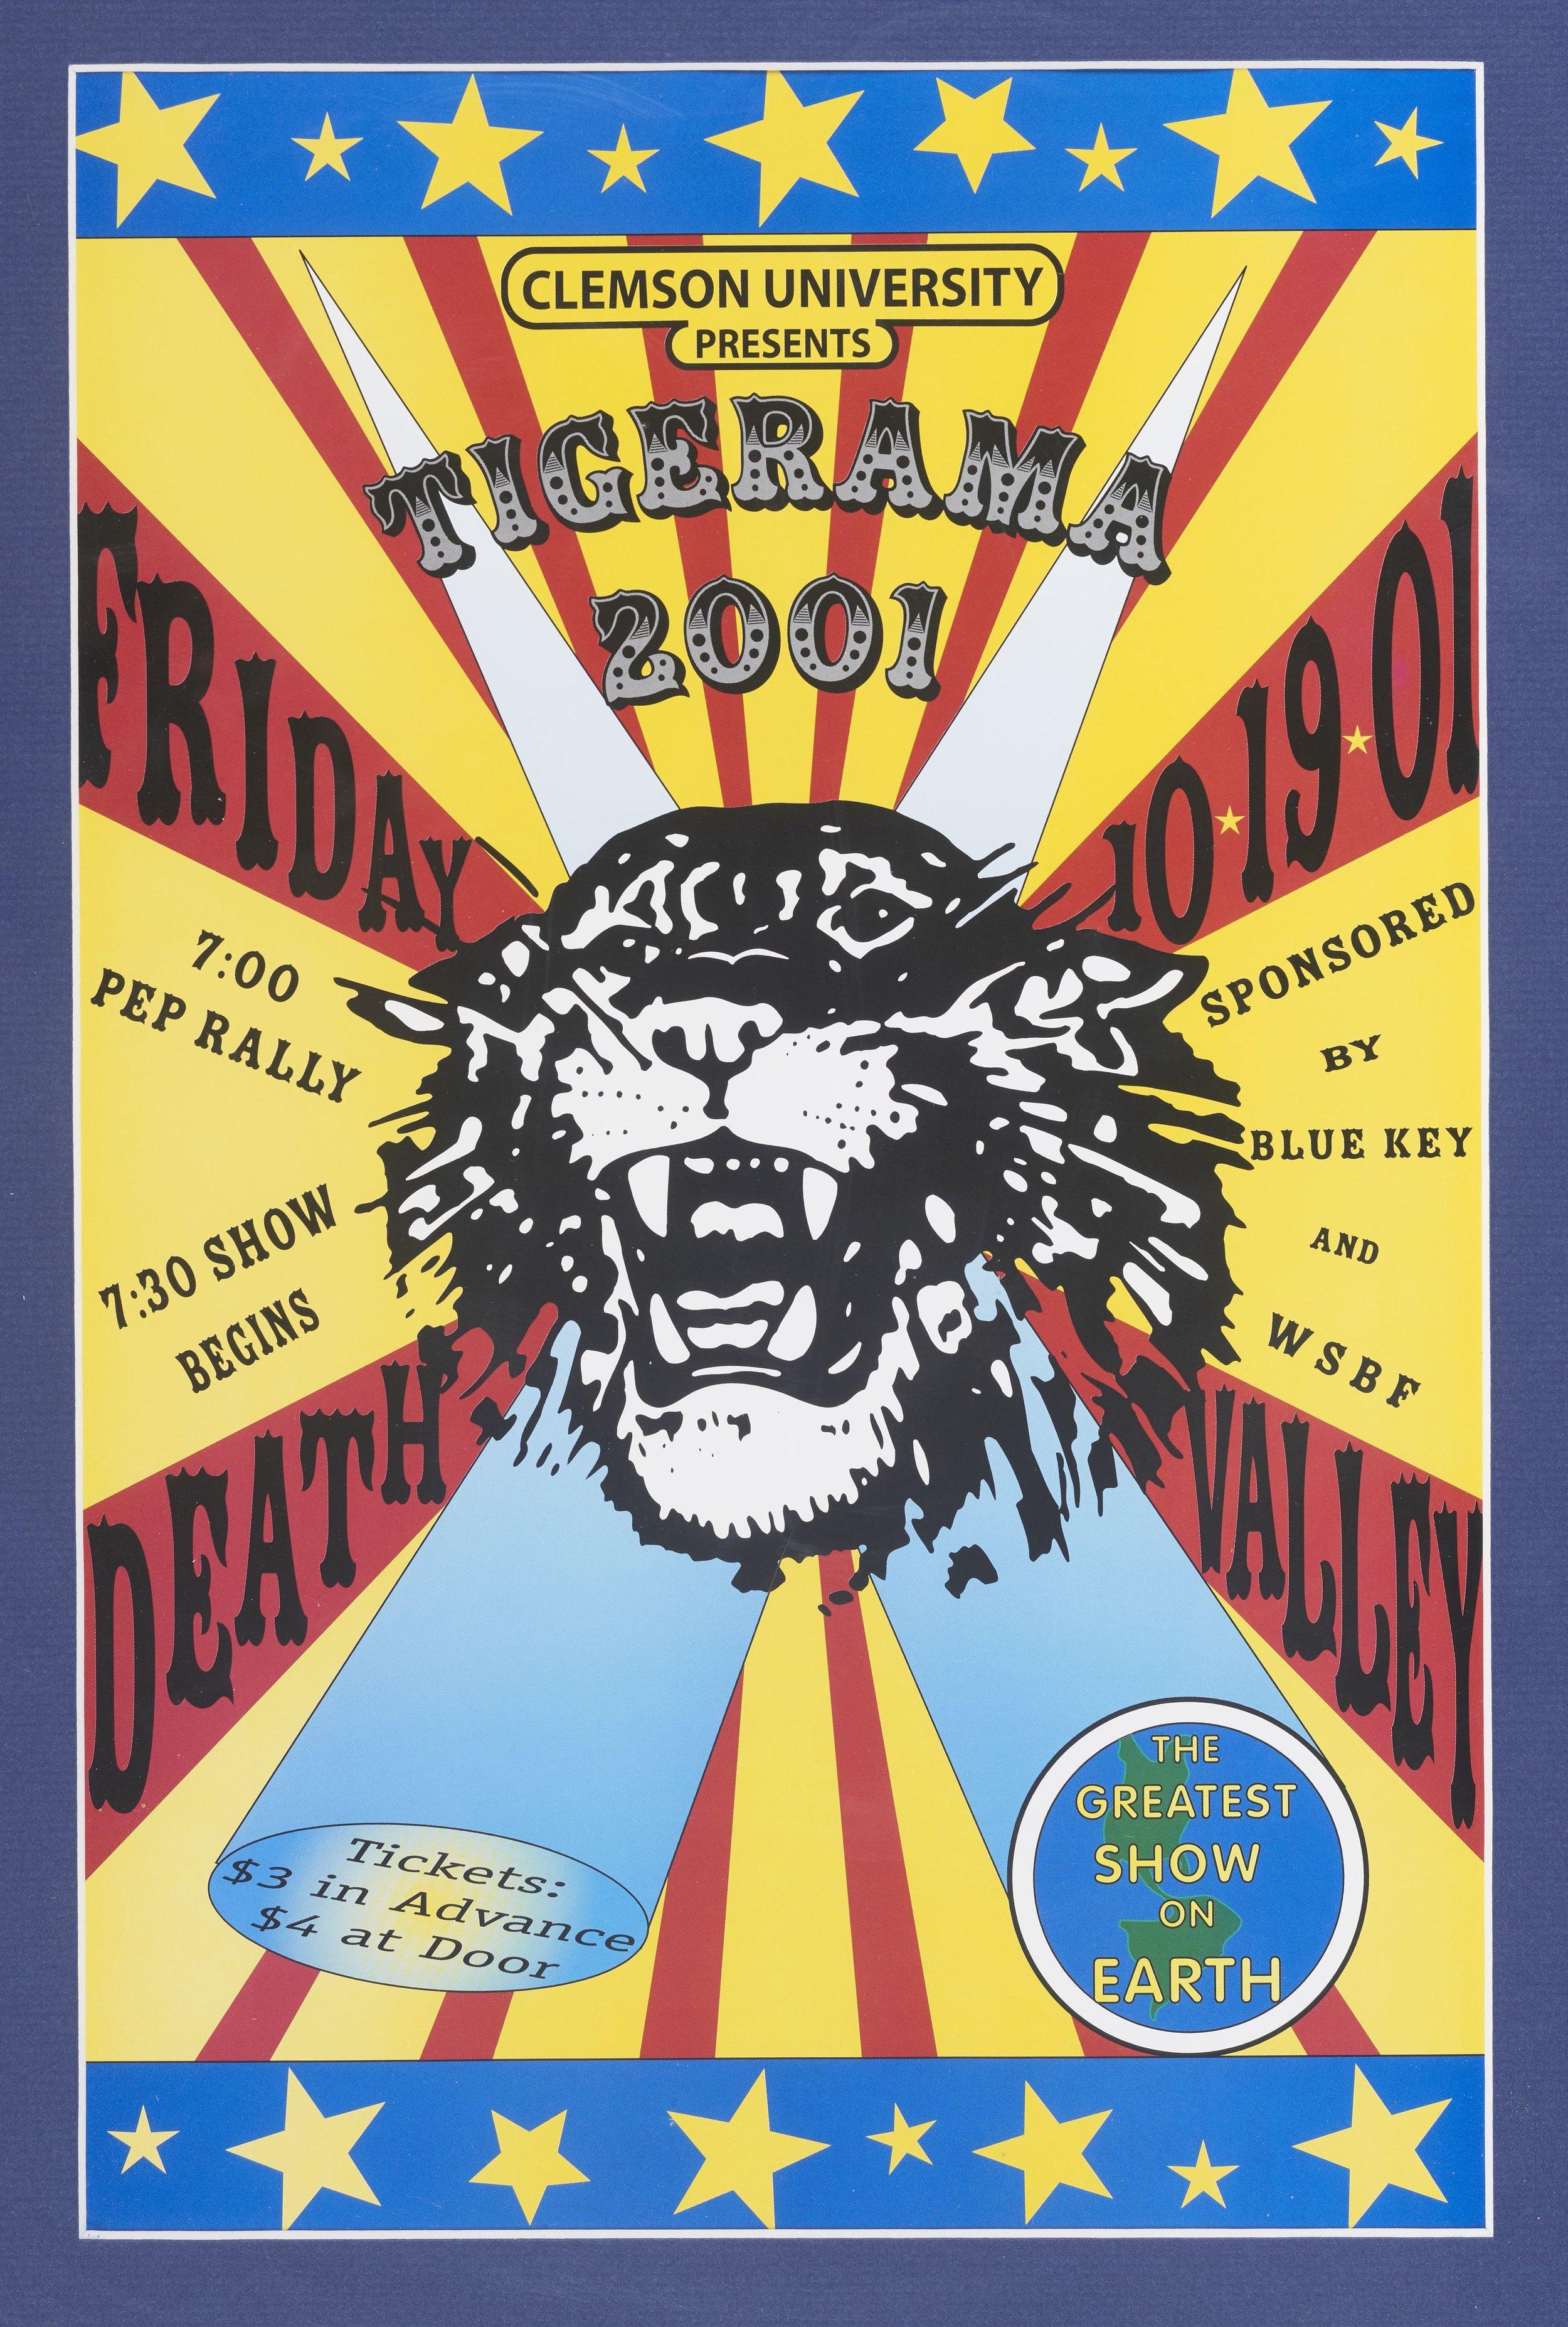 Tigerama 2001